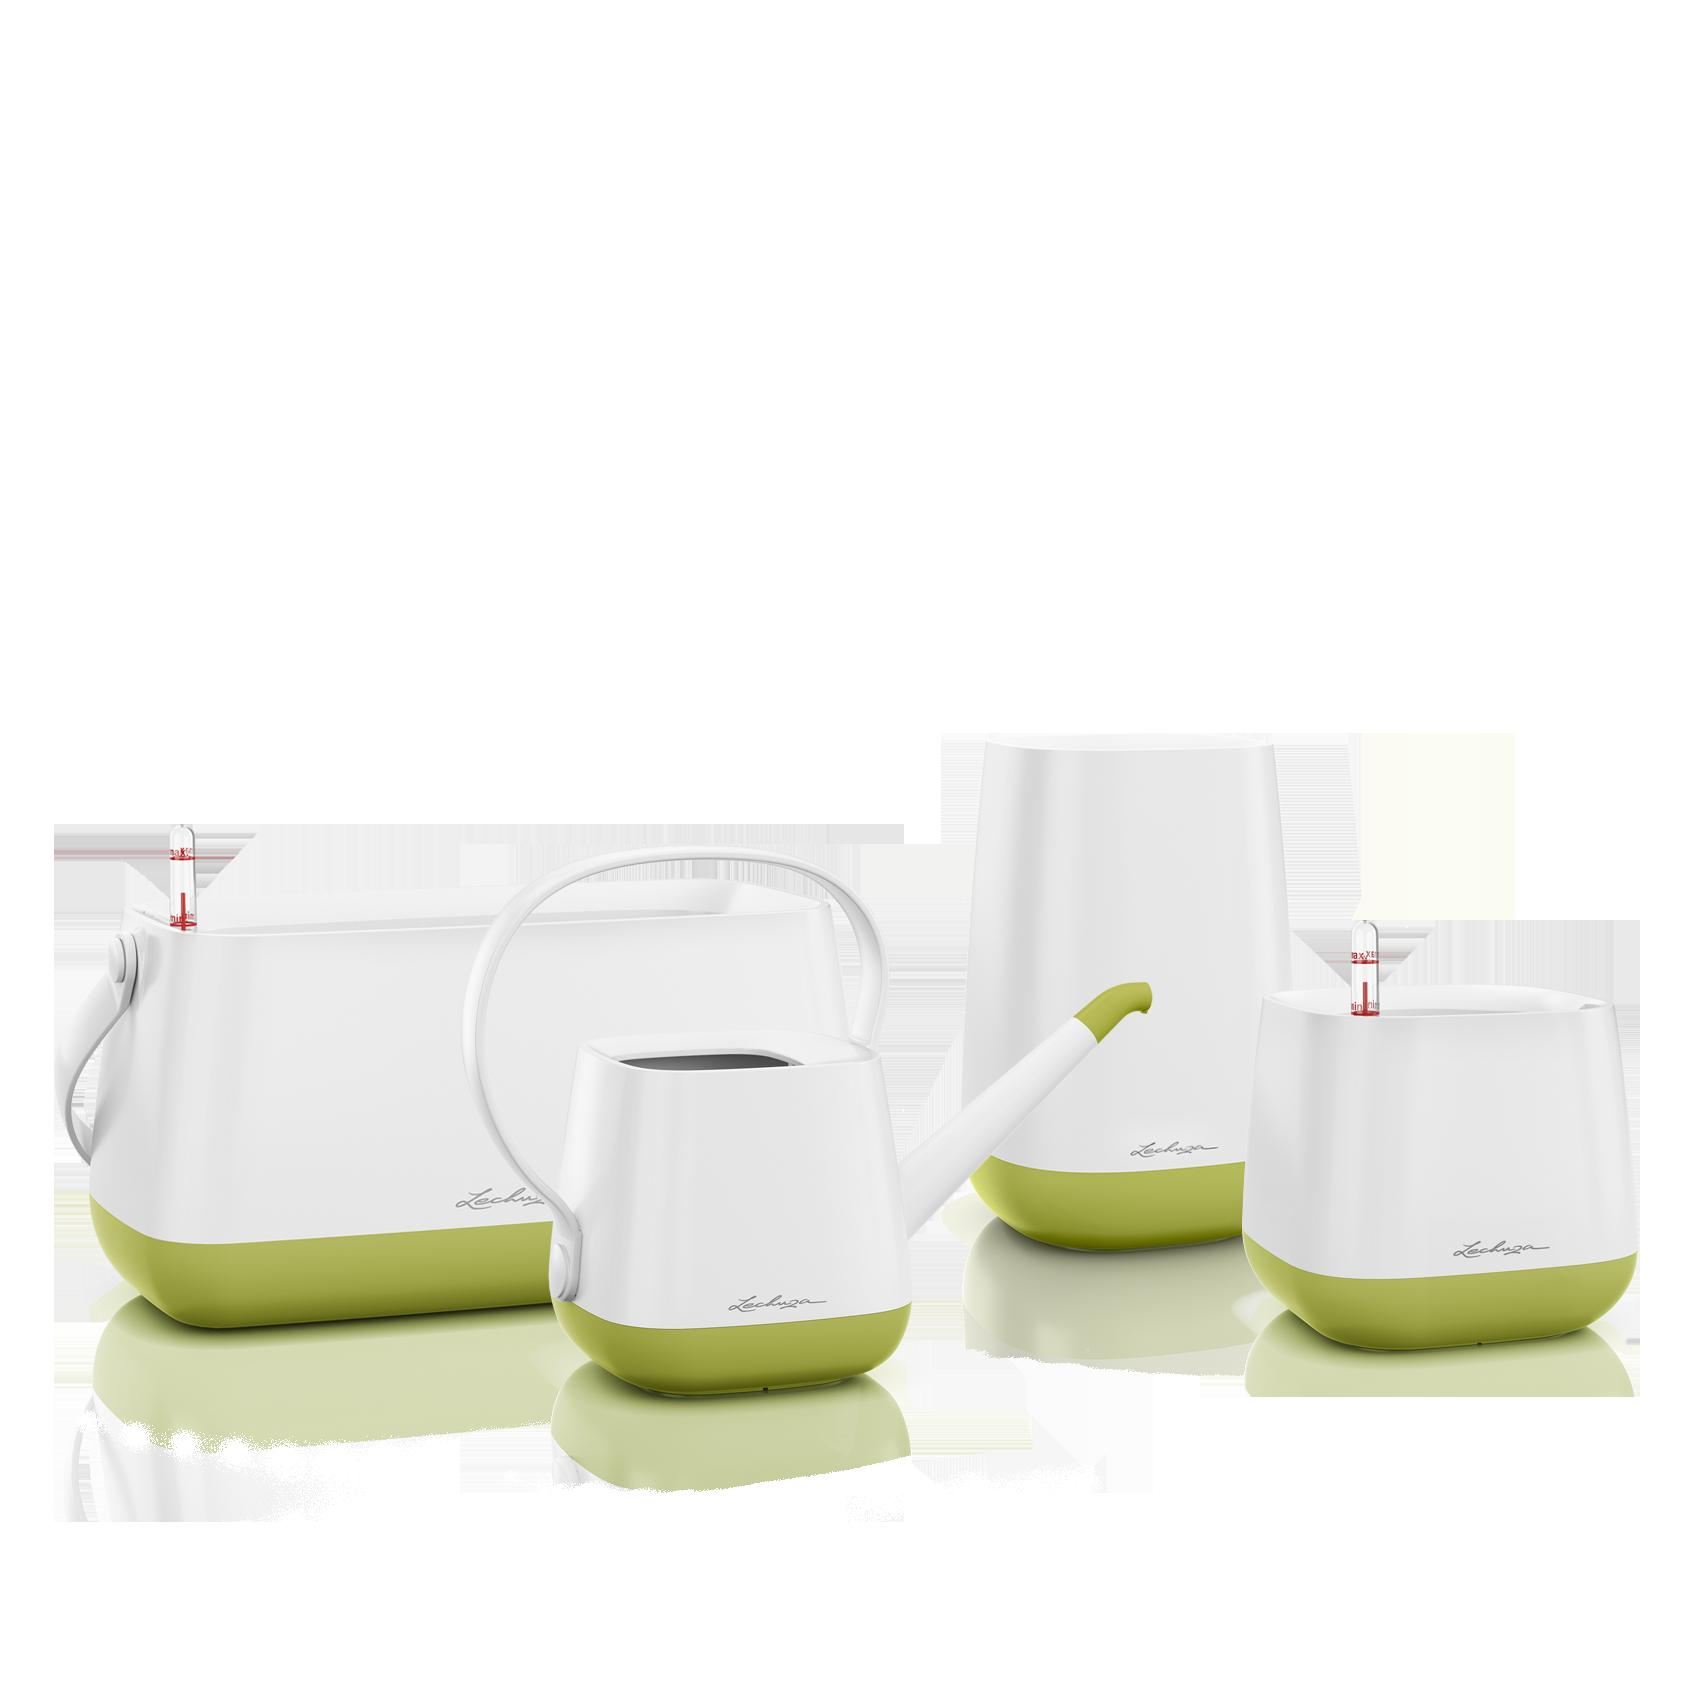 Set YULA blanc/vert pistache satiné